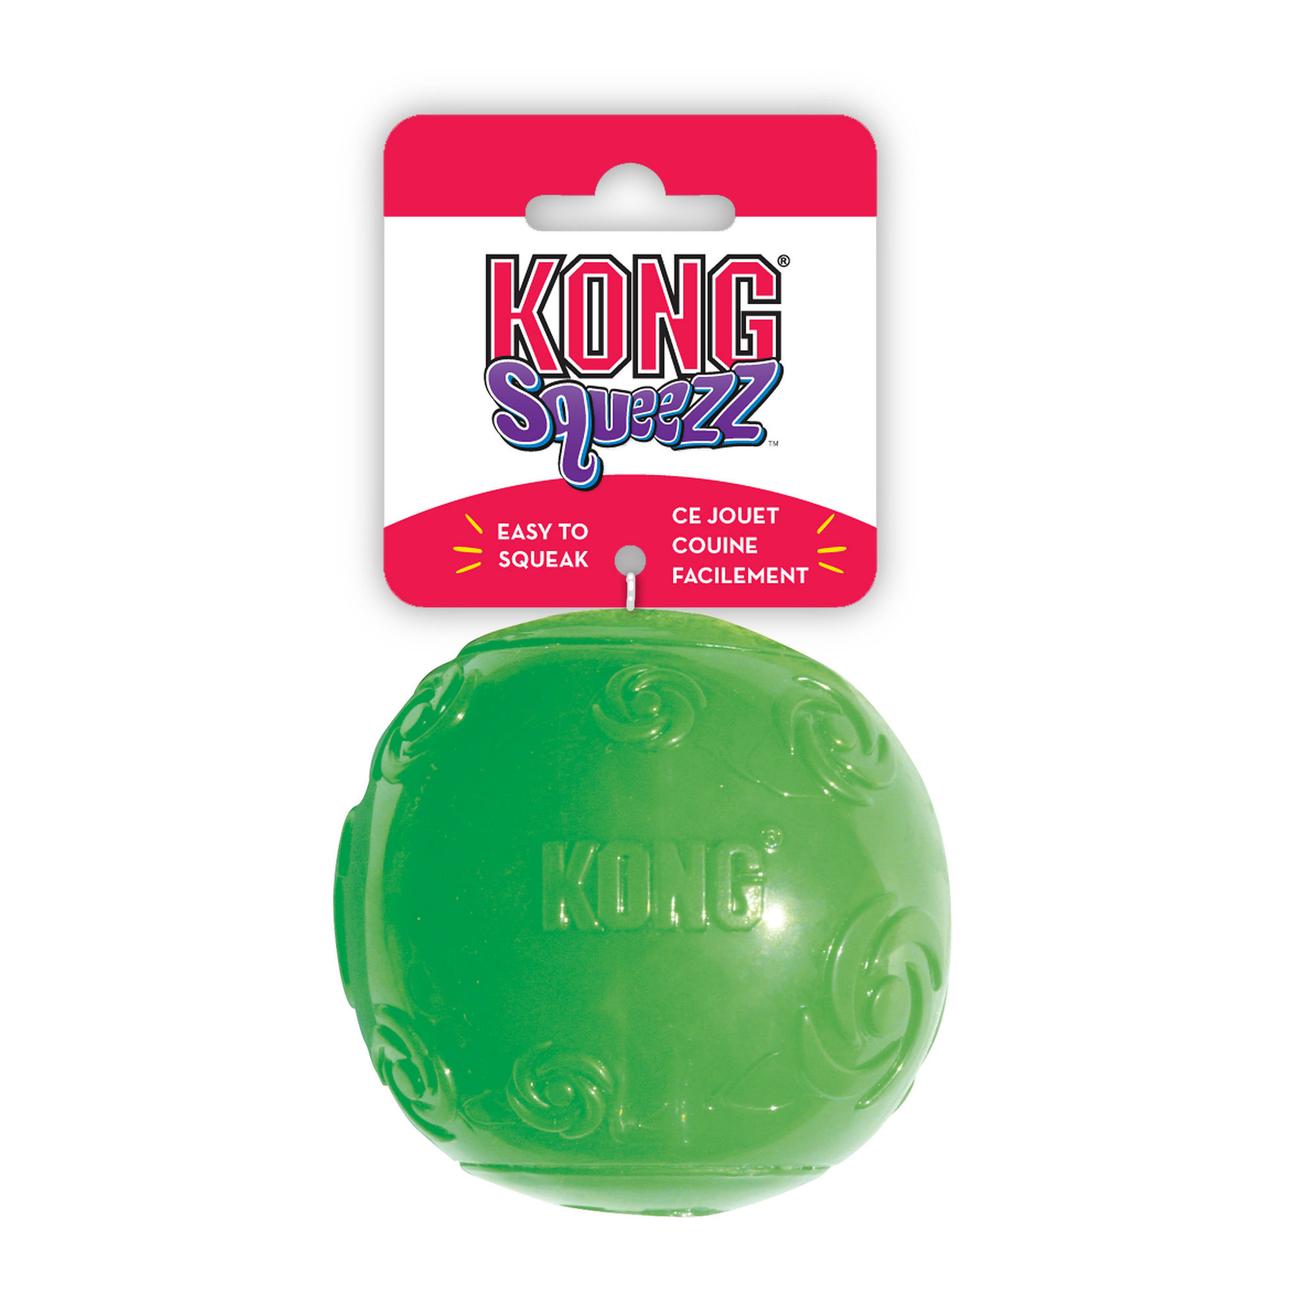 KONG Squeezz Ball Hundespielzeug, Bild 4